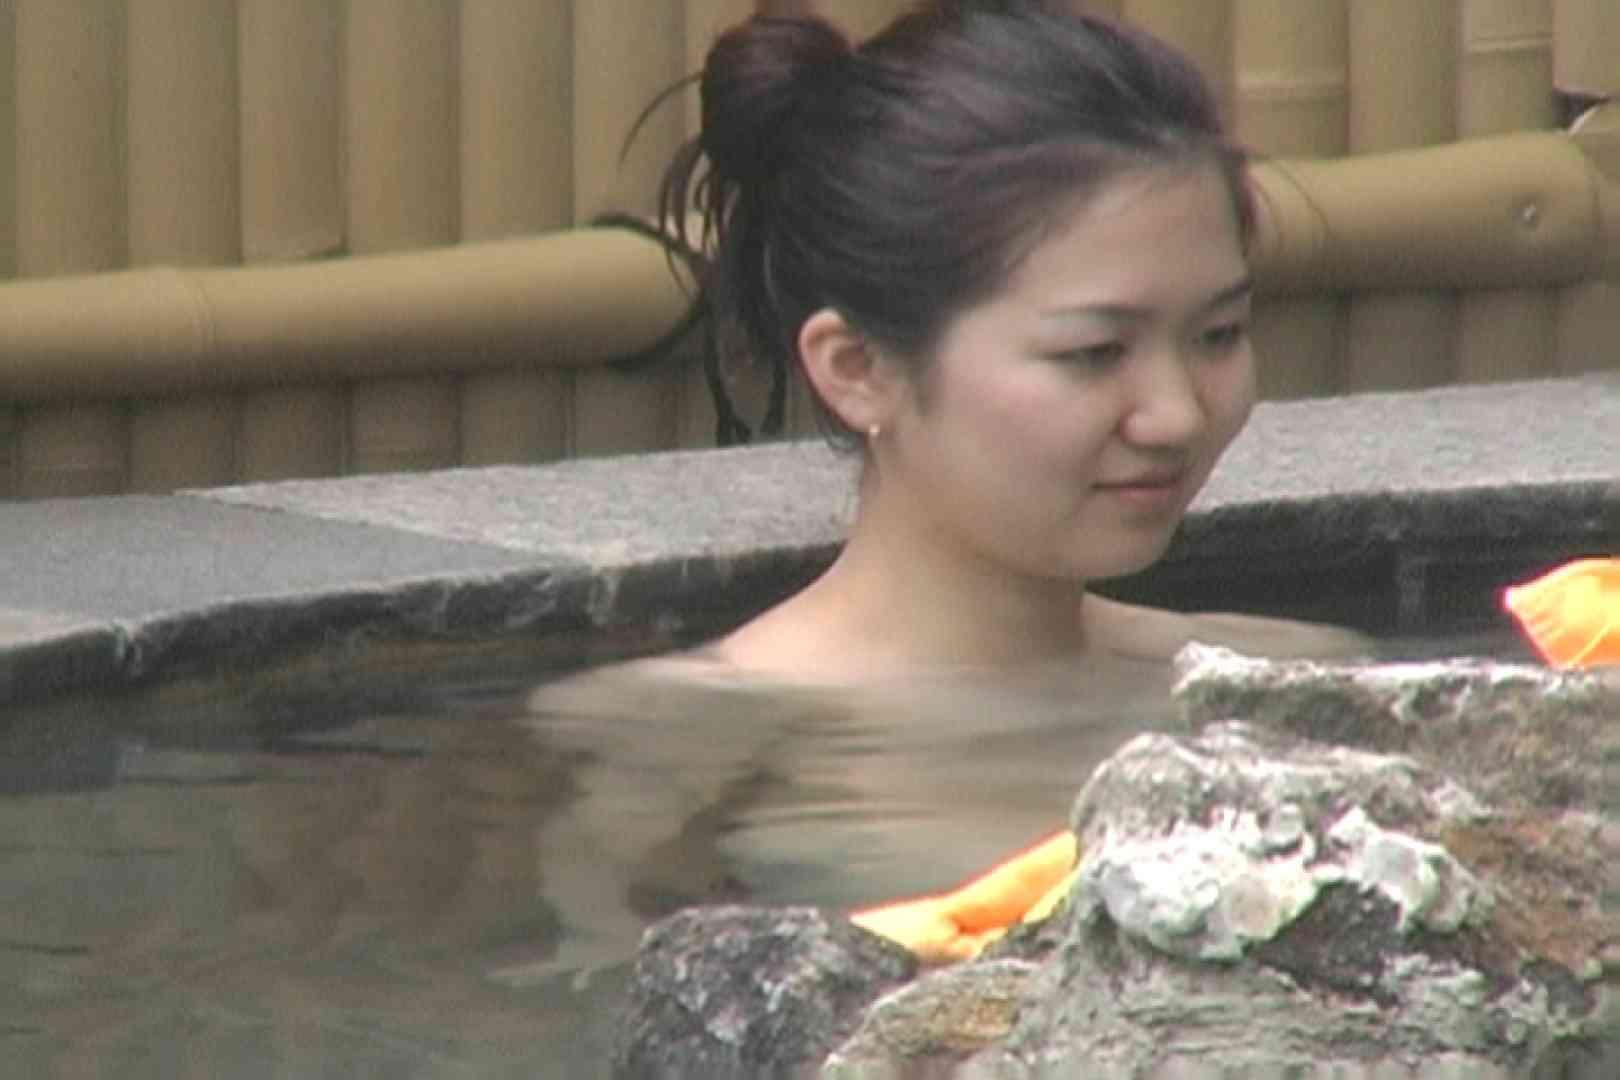 Aquaな露天風呂Vol.641 盗撮師作品 | 露天風呂突入  97pic 1